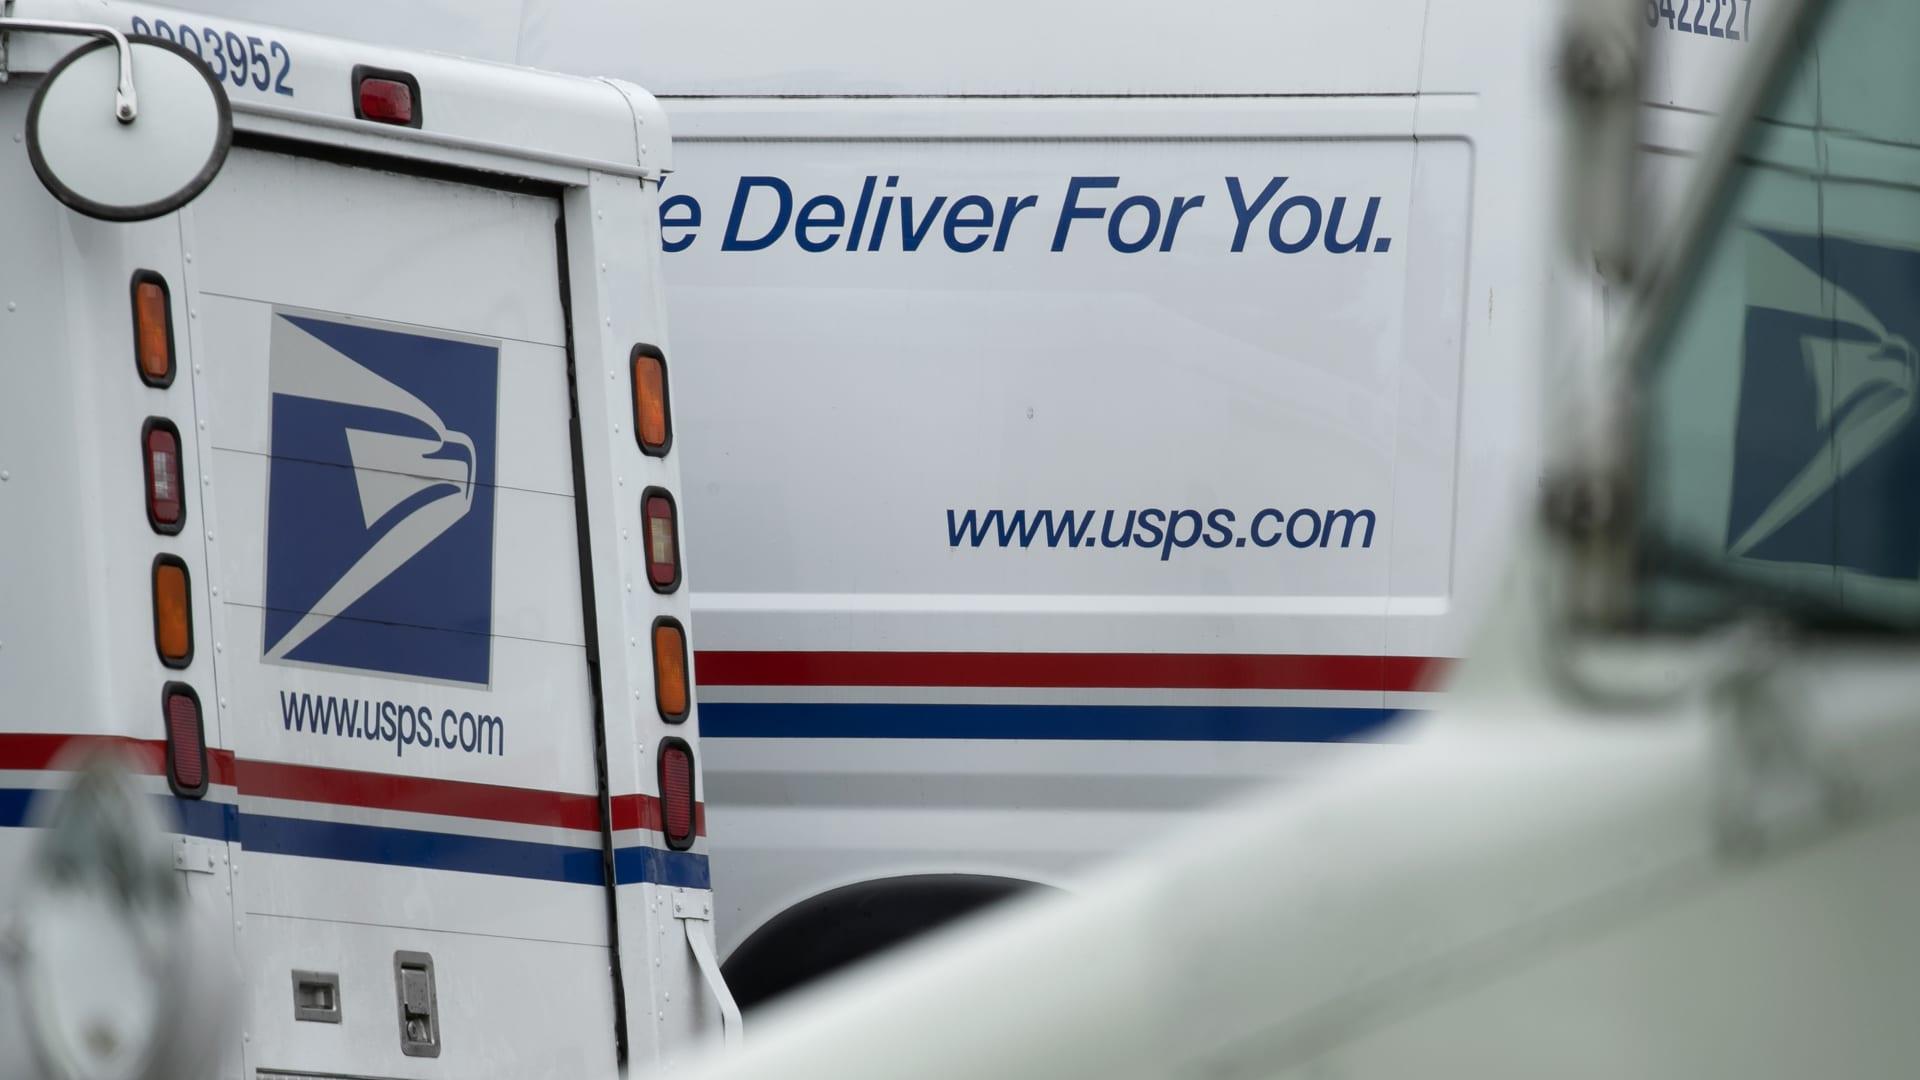 USPS Trucks sit at a U.S. Postal Service (USPS) facility in Elkridge, Maryland, U.S., on Sunday, Aug. 16, 2020.